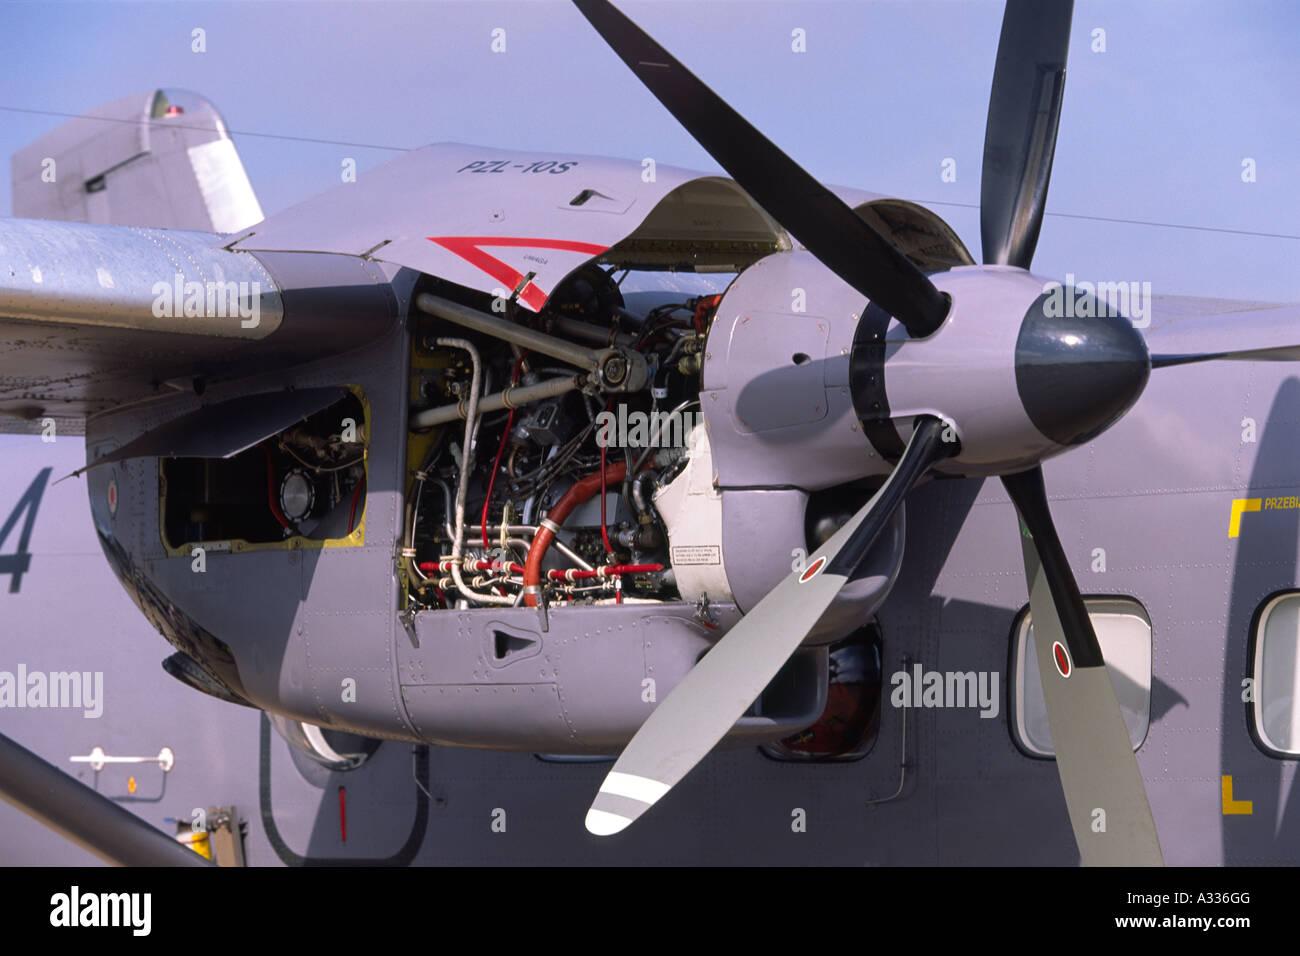 Pratt & Whitney PT6A-65BPZL turboprop engine & Hartzell